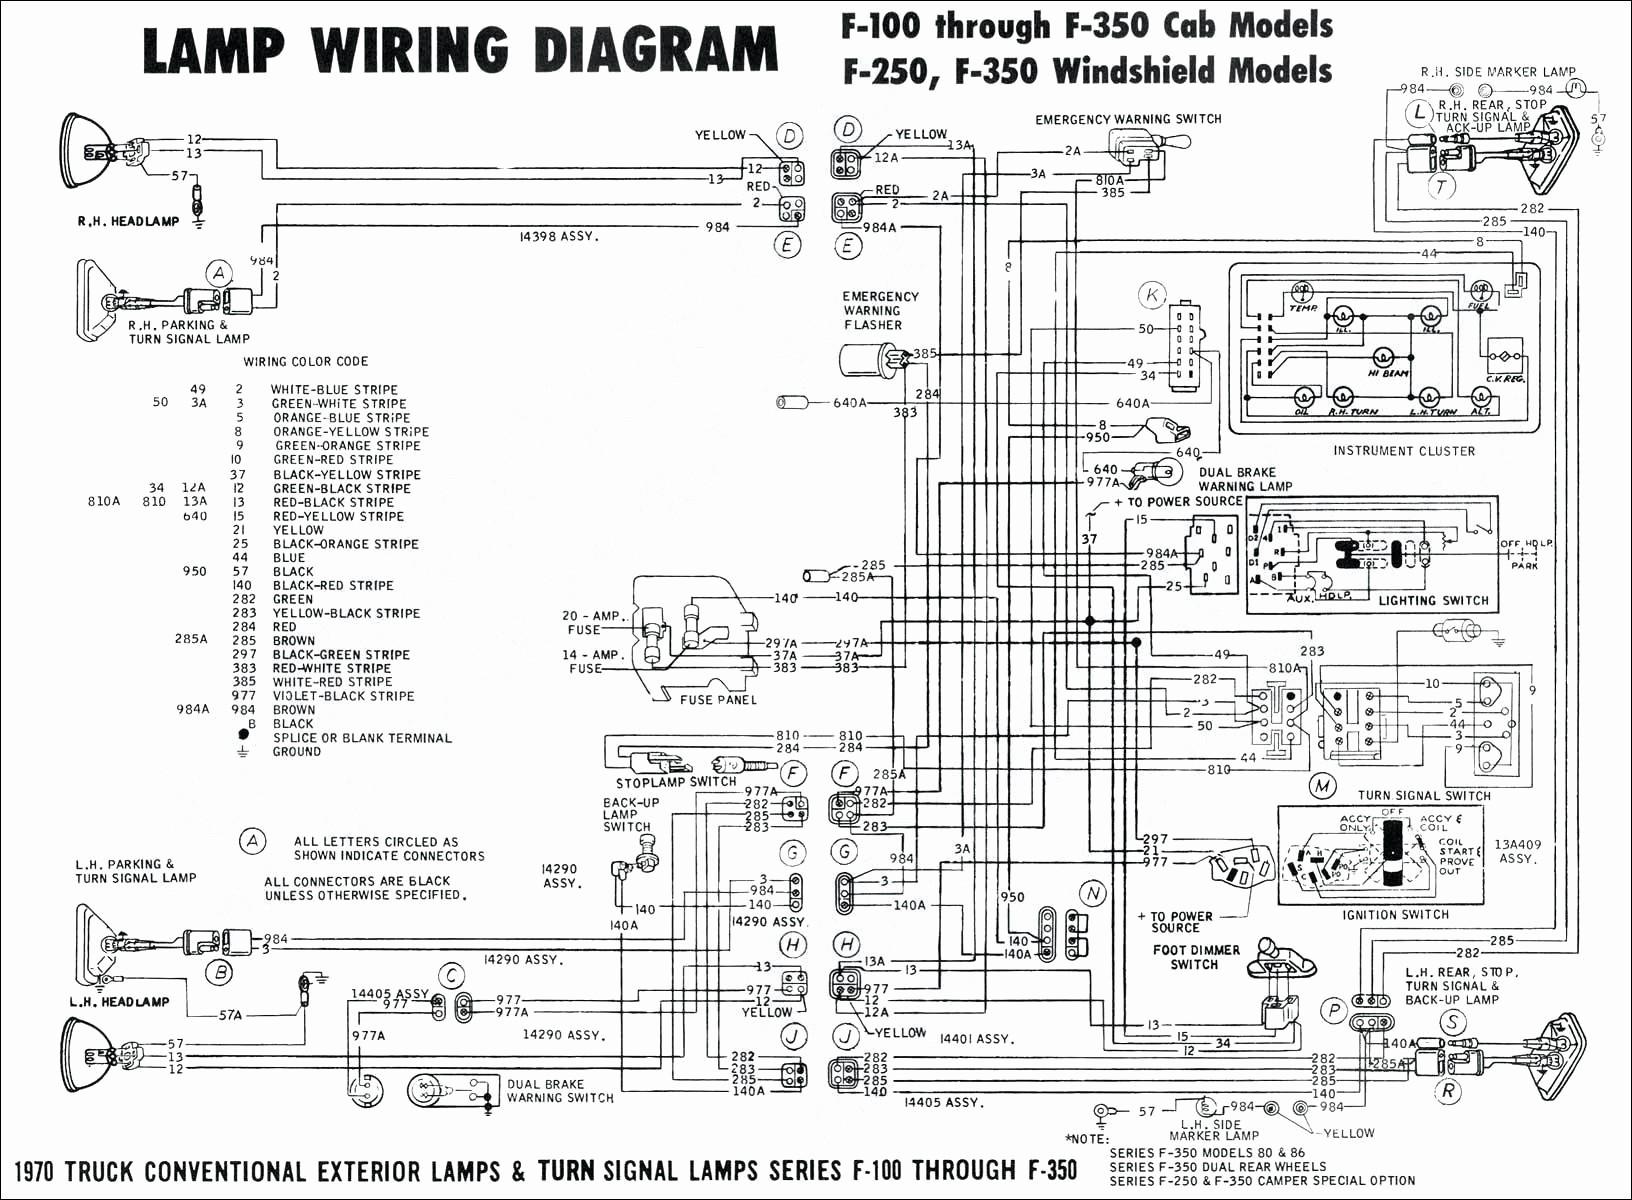 Electric Water Heater Wiring Diagram Wiring Diagram ... on